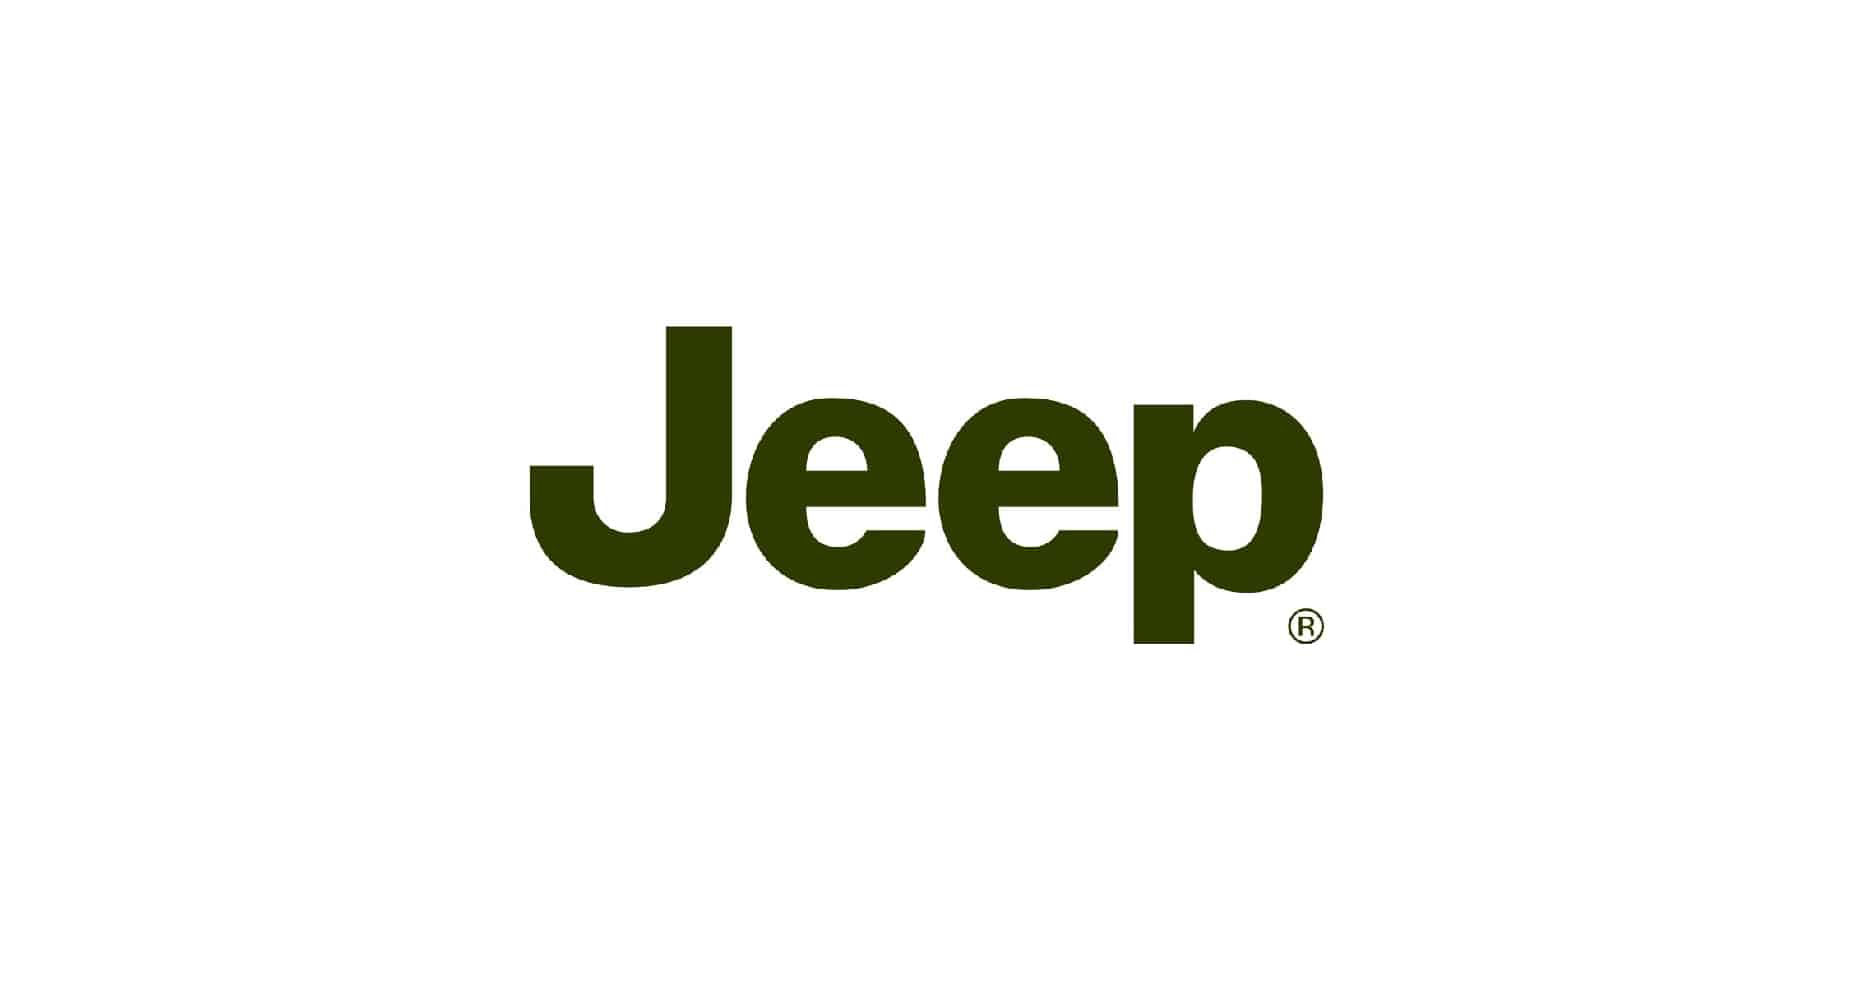 jeep logo design